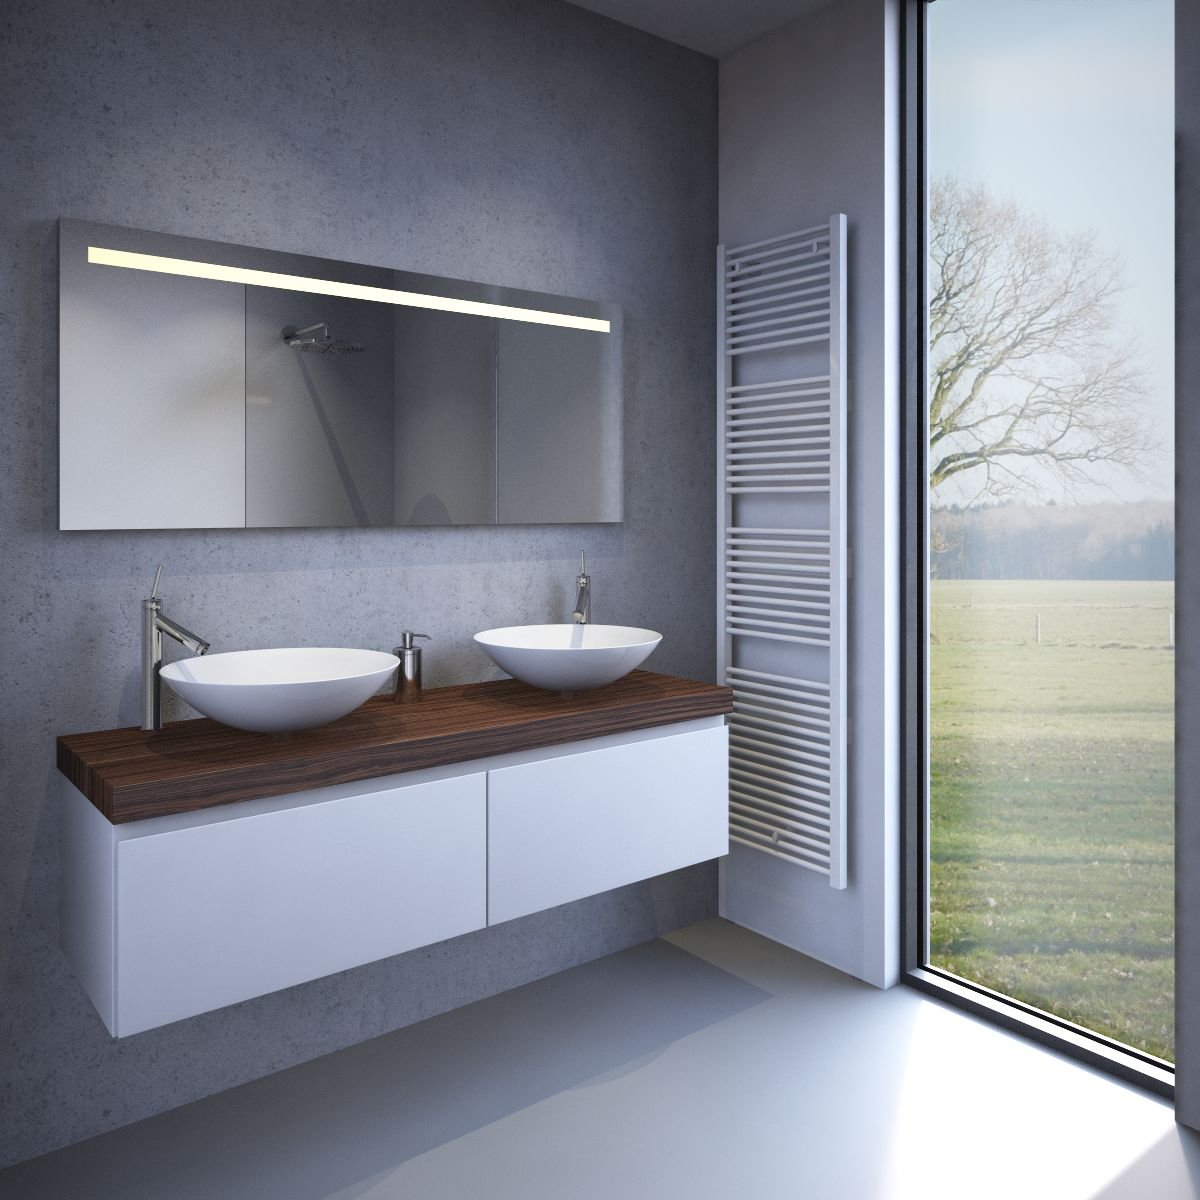 bol.com | 160 cm brede badkamer spiegel met verlichting verwarming ...